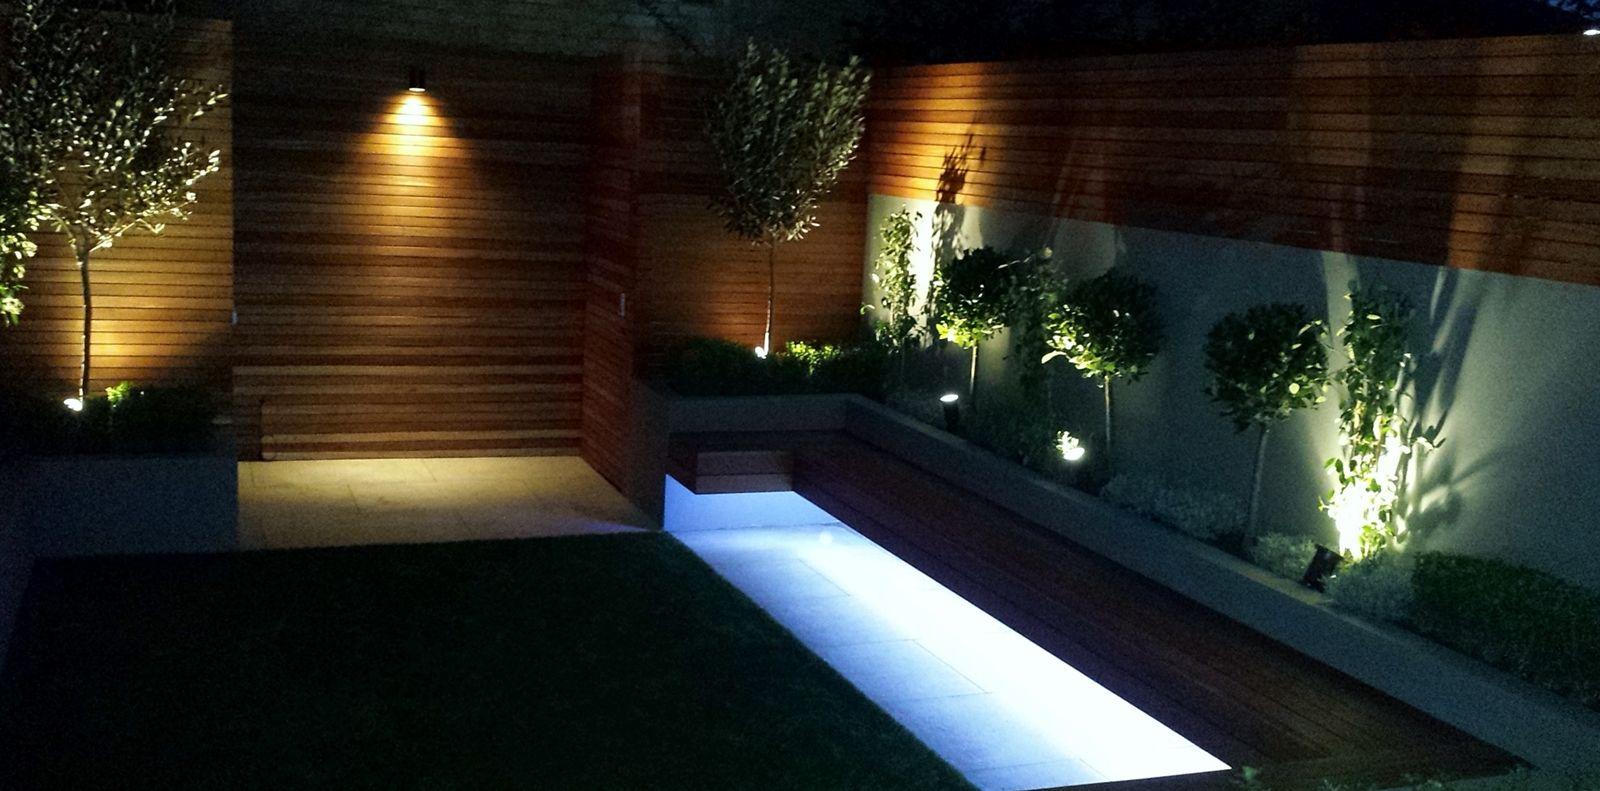 modern garden design ideas great lighting fireplace hardwood screen plastered rendered walls clapham battersea south west london led strip lights